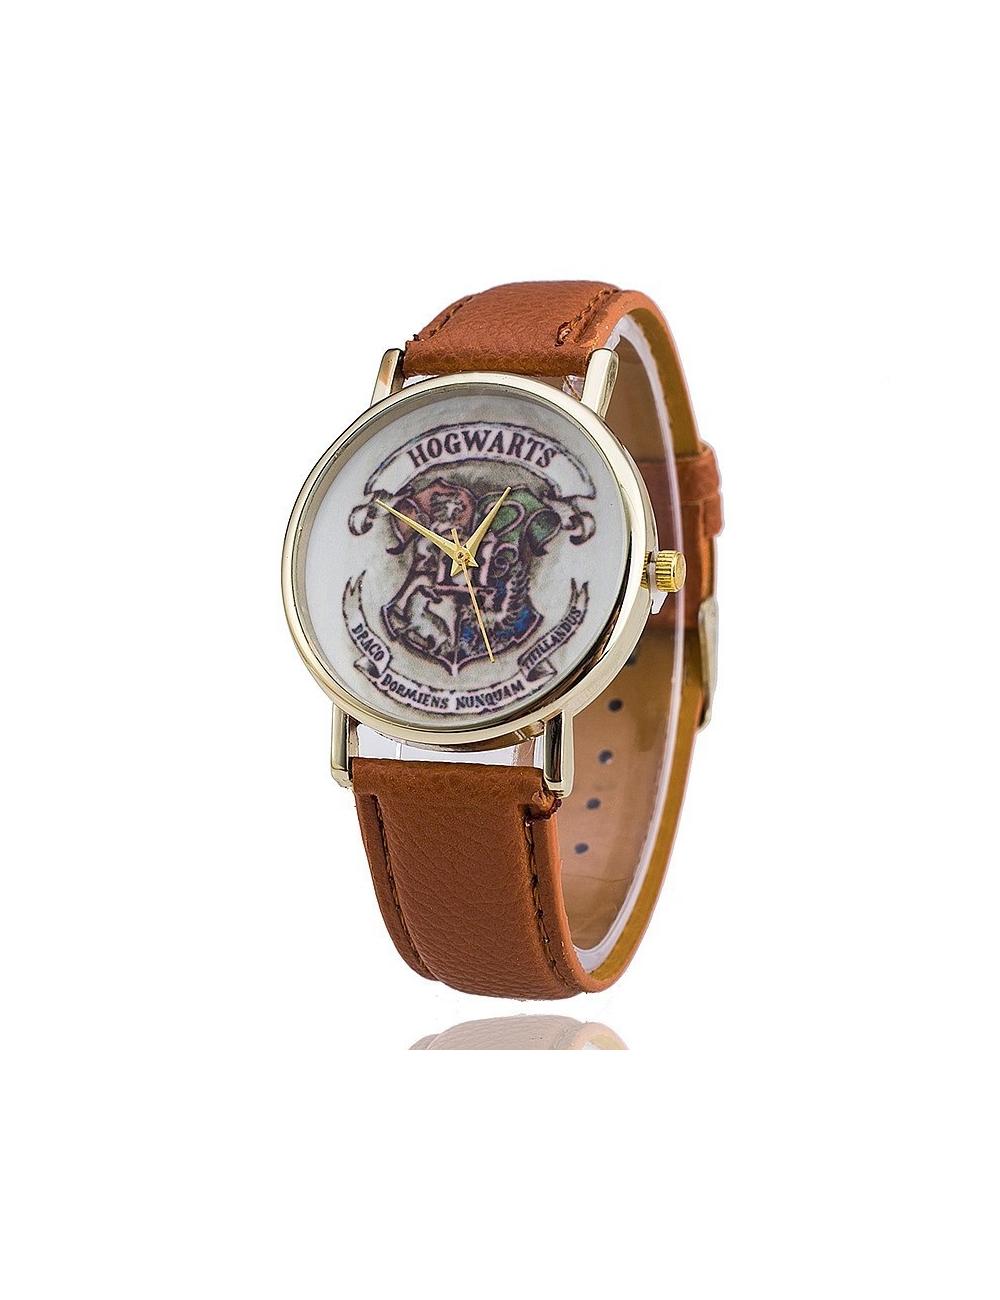 Reloj Hogwart Dayoshop 31,900.00